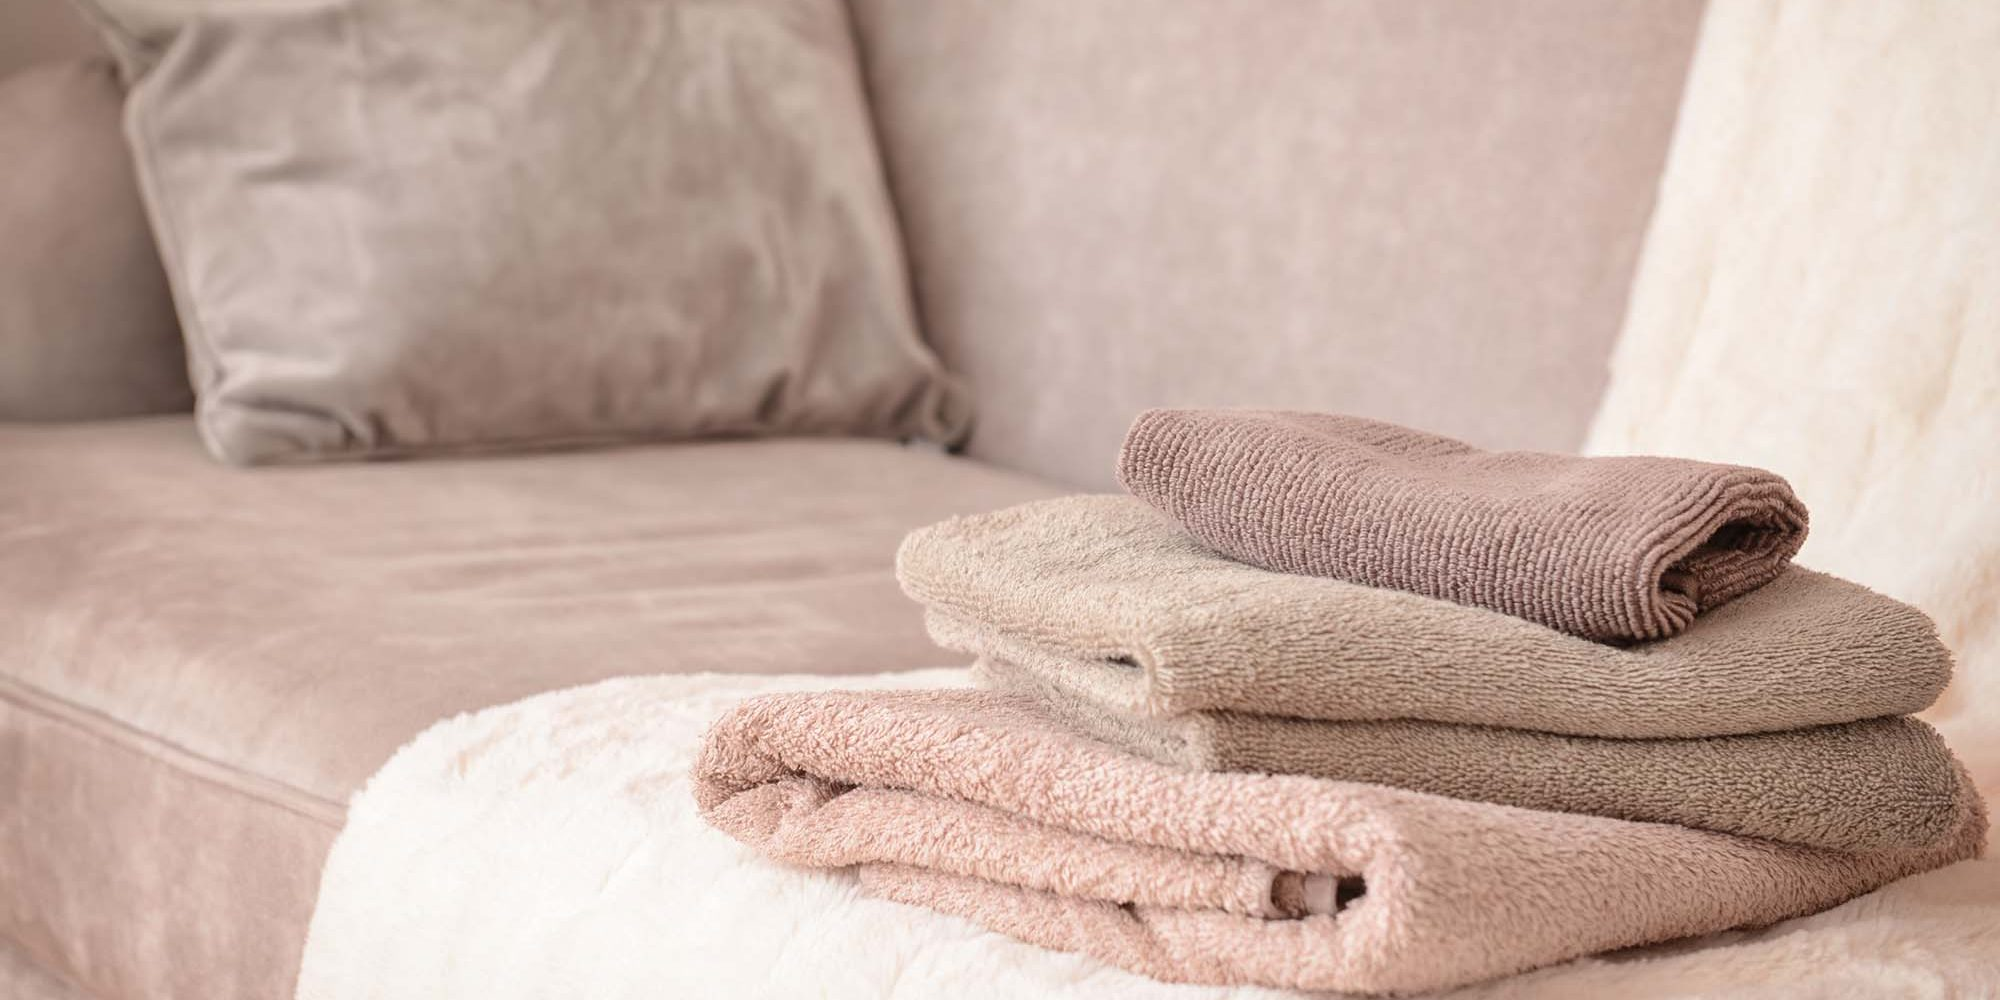 Clean soft towels on sofa